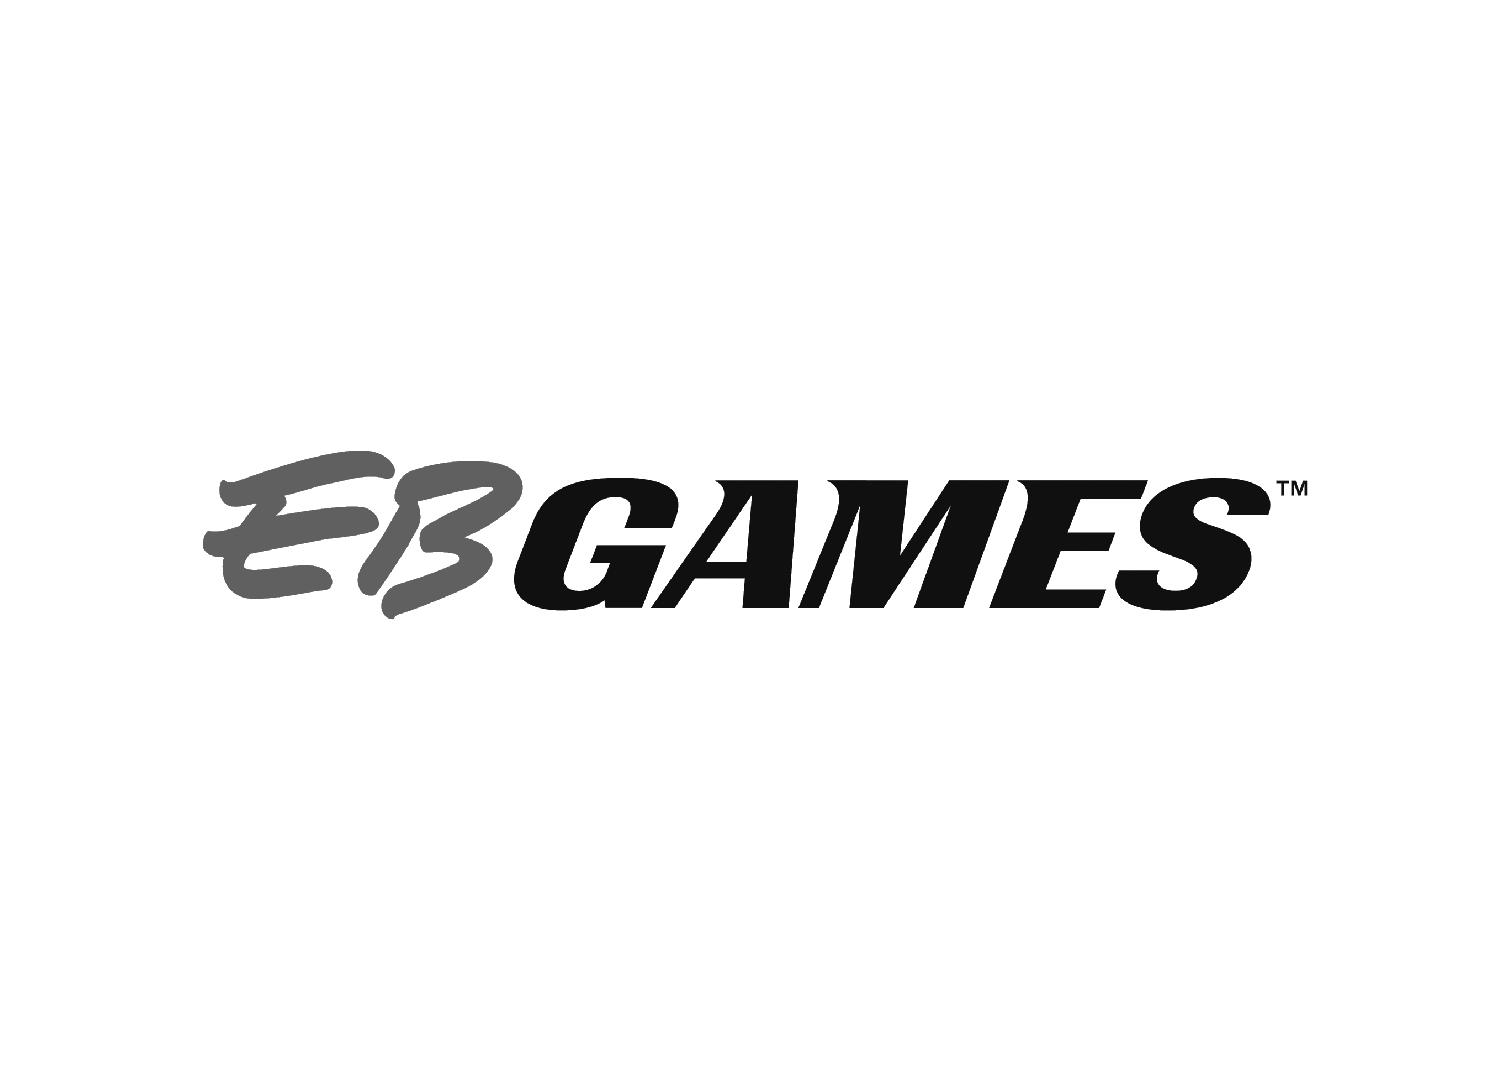 EB Games-01.jpg